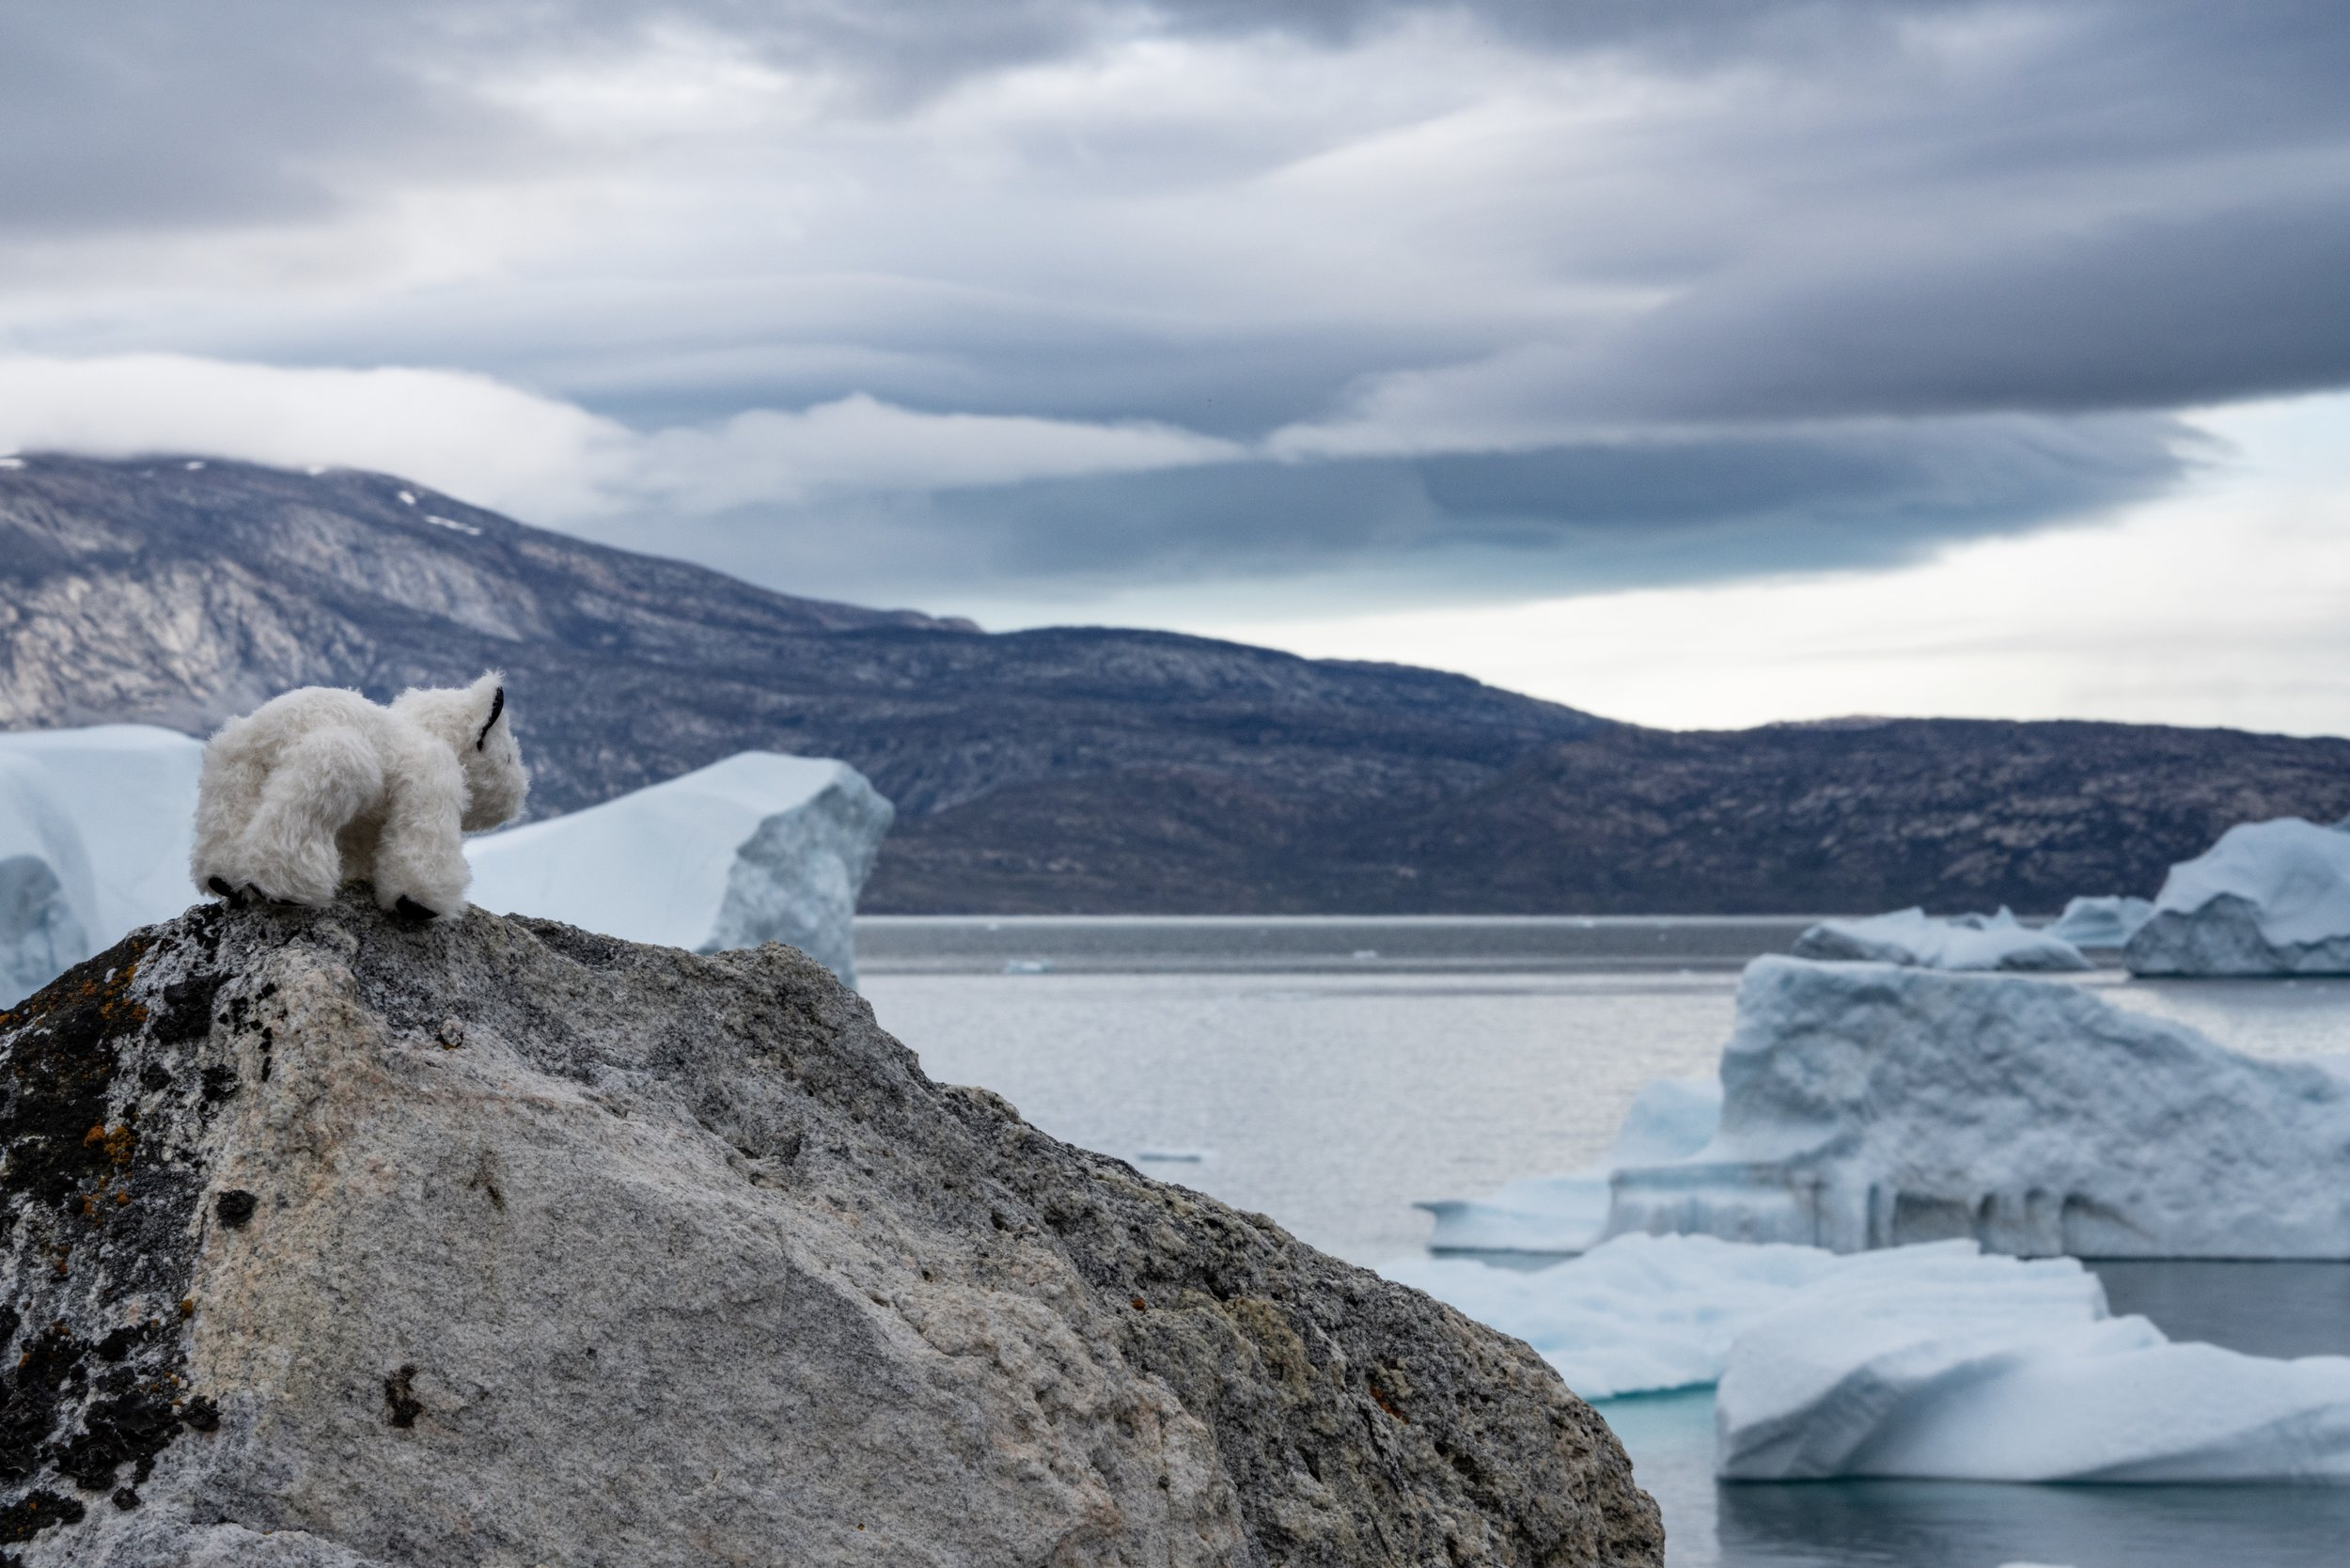 70°40'N   51°24'W ● Storøen   Greenland